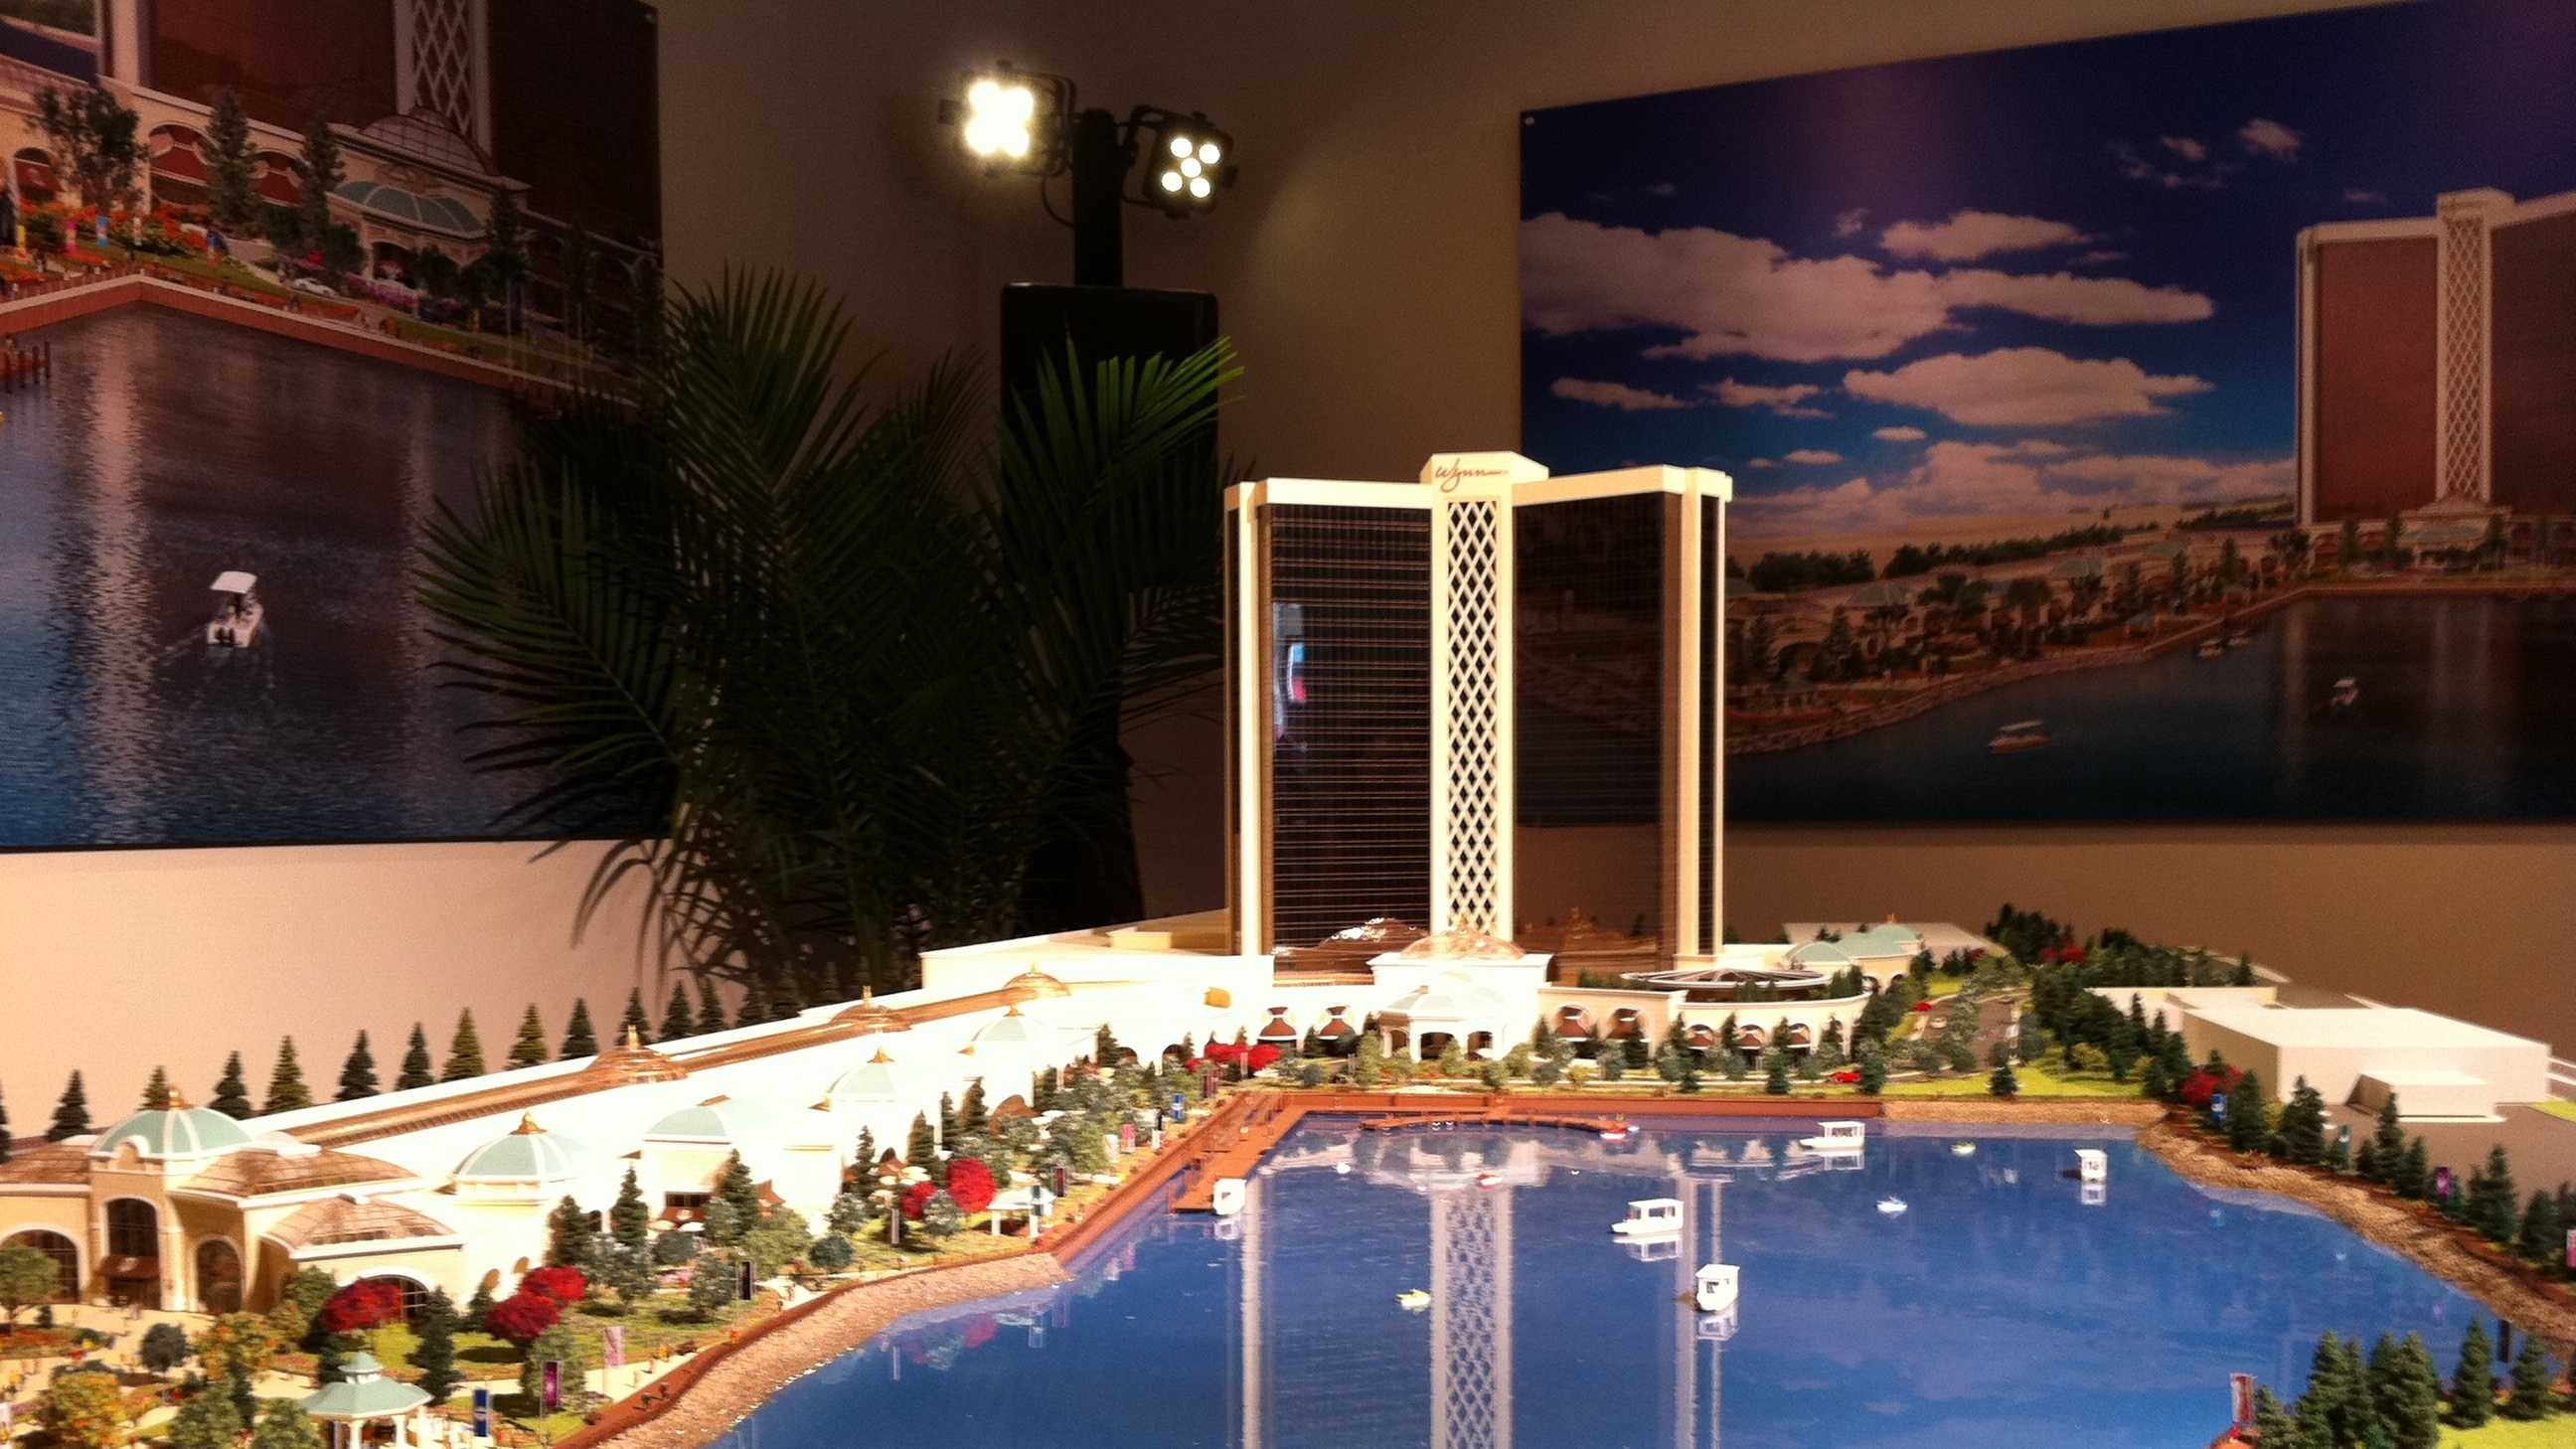 Wynn Casino Reveal 061313 02.JPG